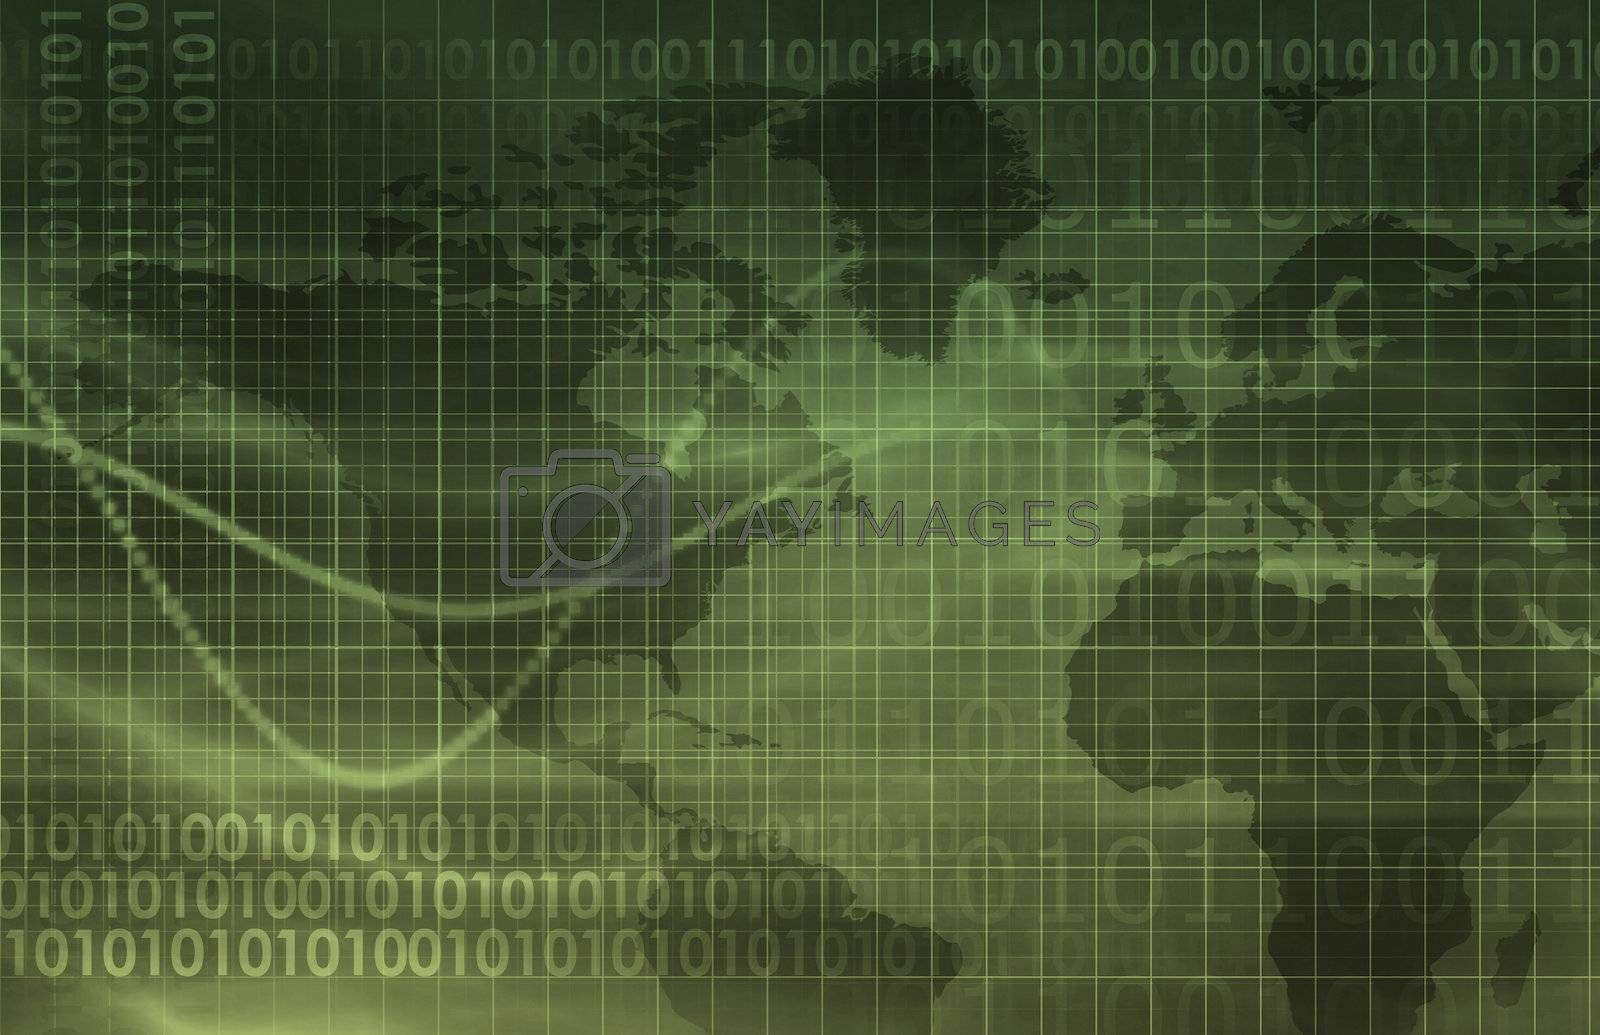 Technology Background Digital Energy as a Art